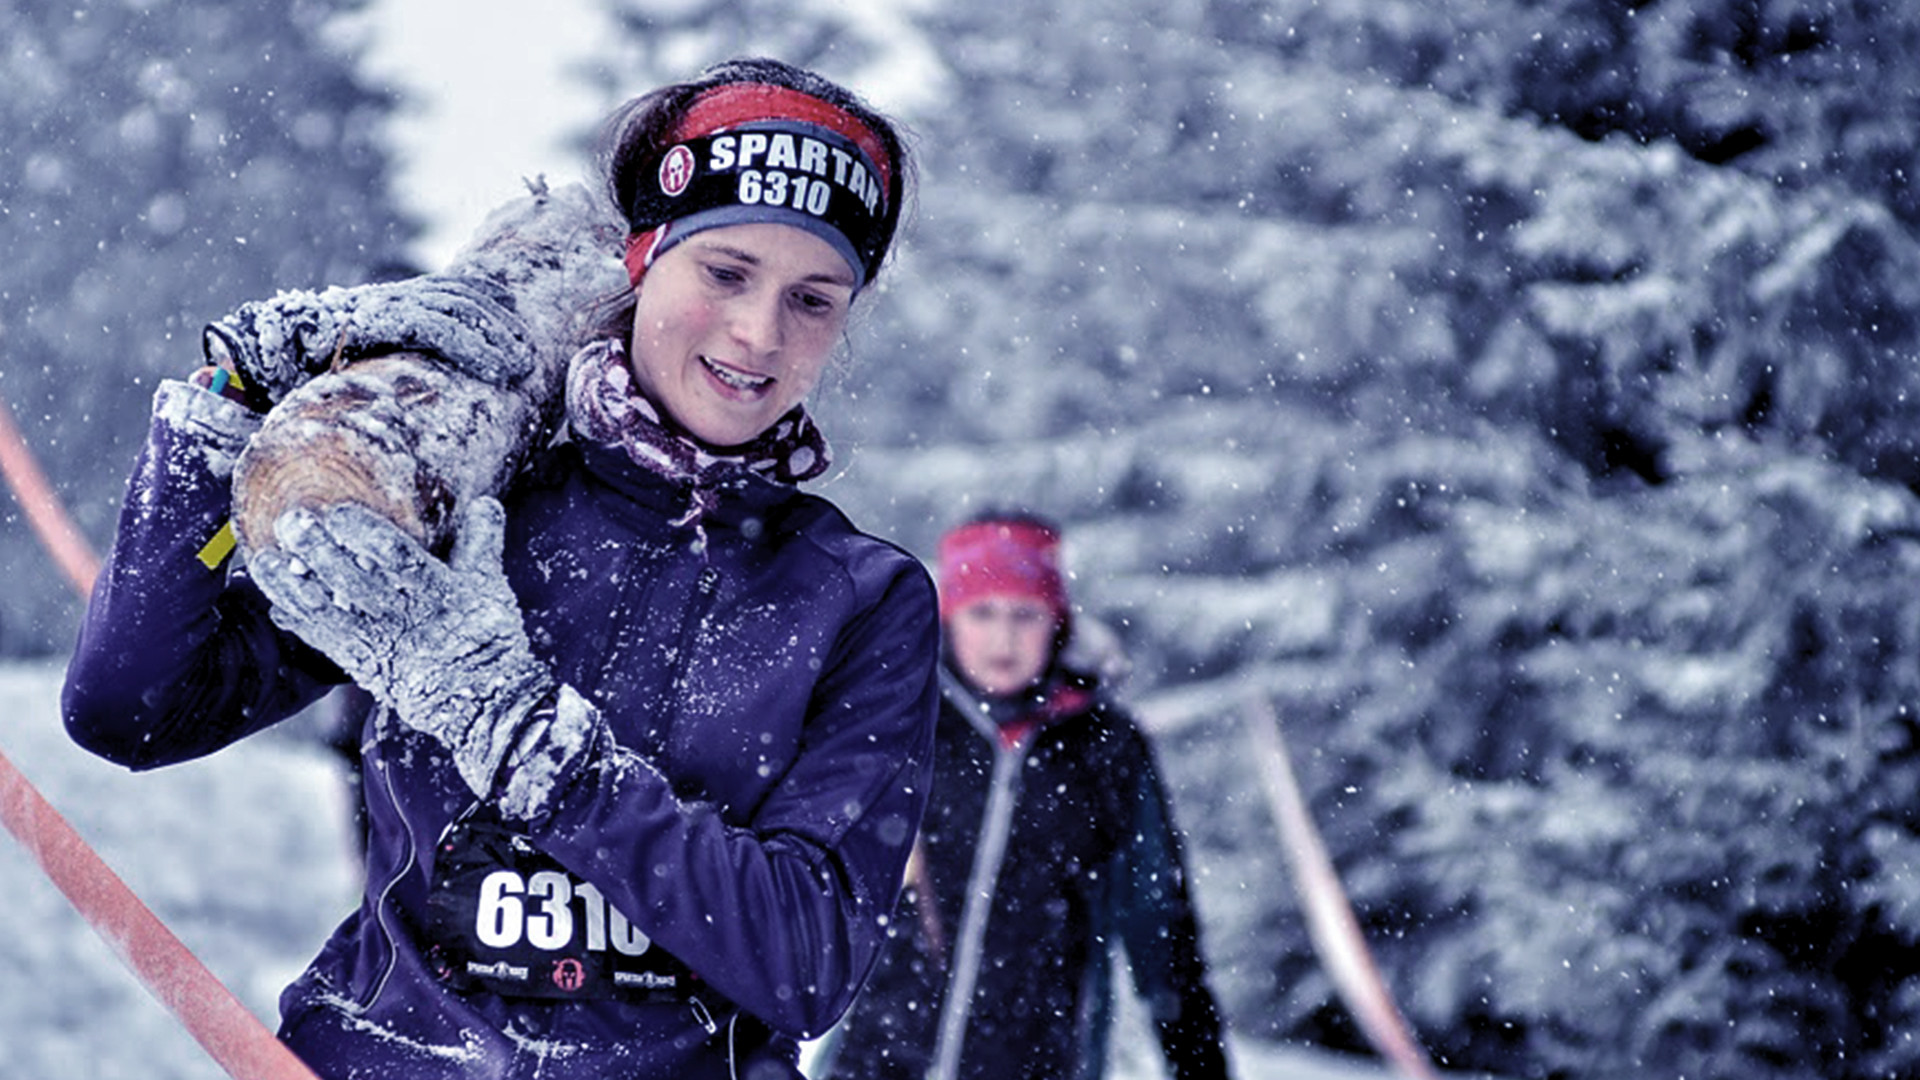 Spartan Race Inc. Obstacle Course Races | Greek Peak Winter Sprint 2018